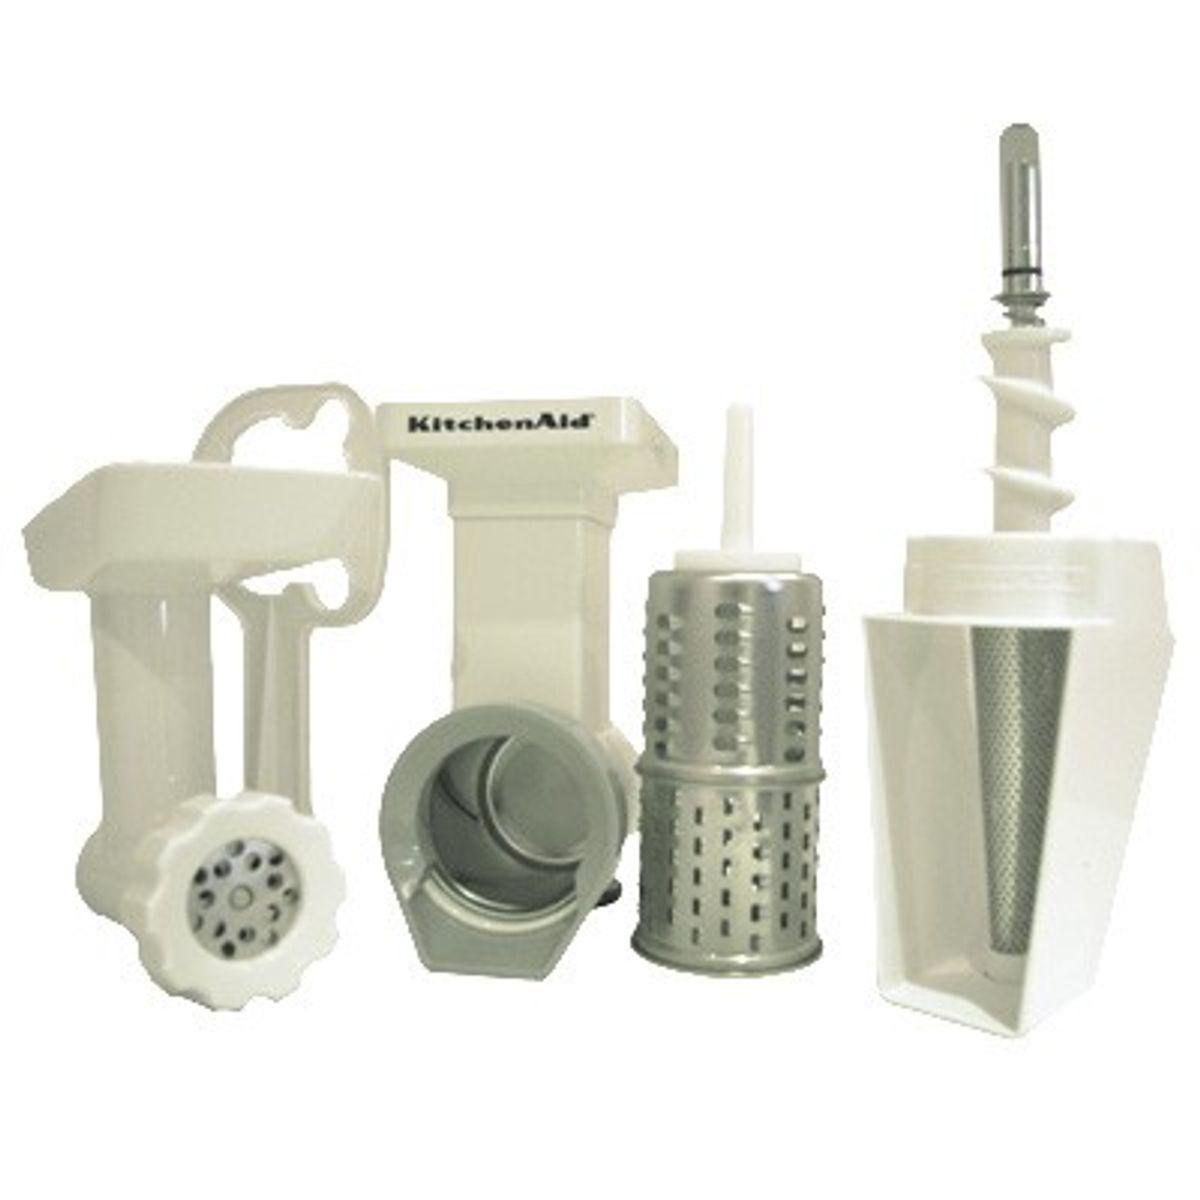 Kit de 3 accessoires fppc (5fga + mvsa + 5fvsp) - Kitchenaid